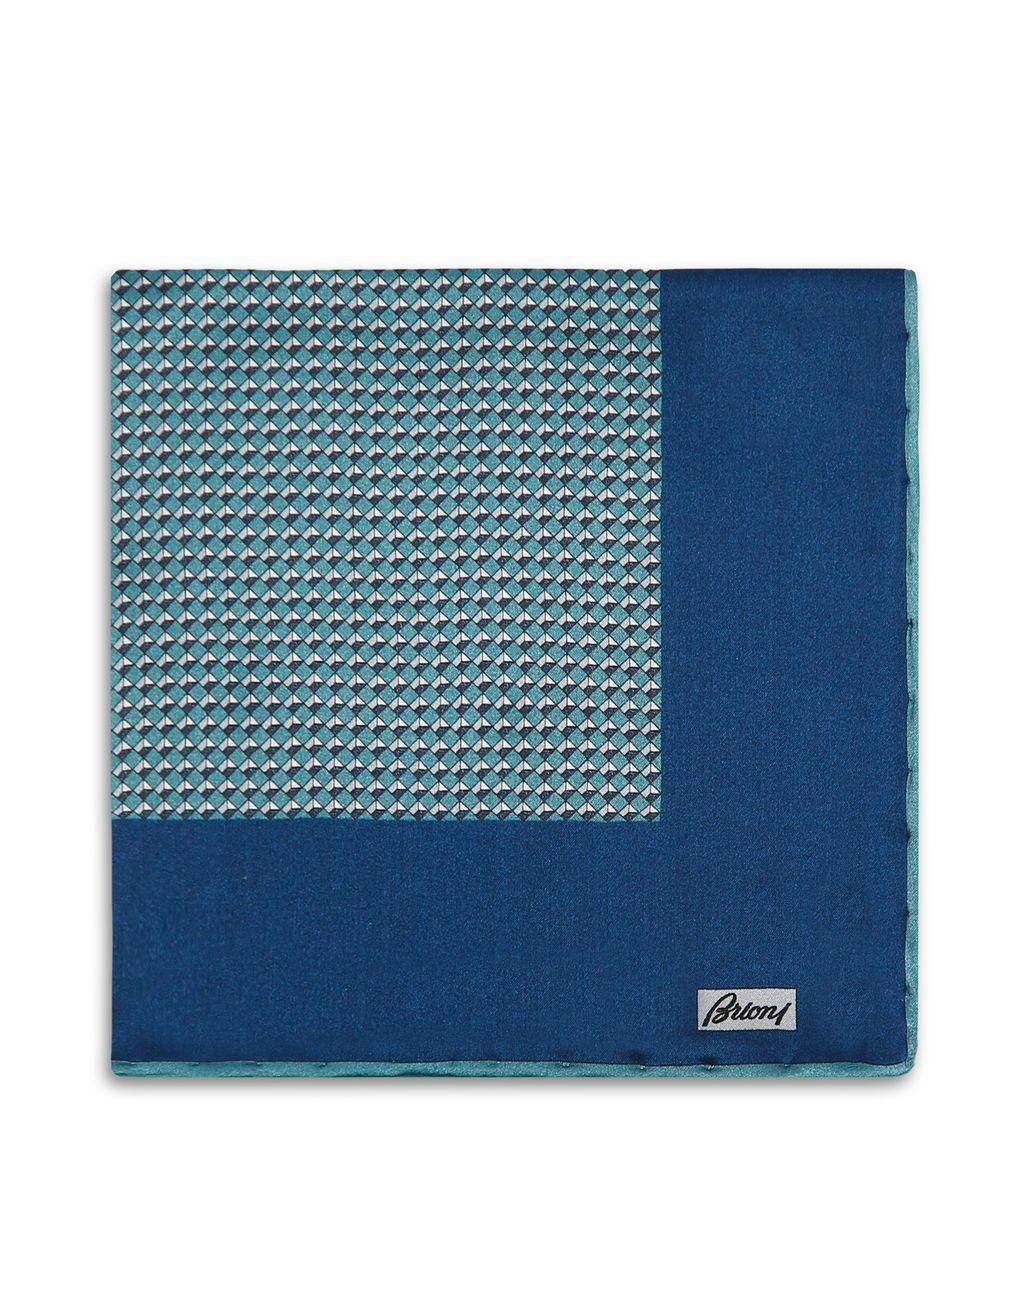 BRIONI Бирюзовый платок-паше с микроузором Галстуки и карманные платки [*** pickupInStoreShippingNotGuaranteed_info ***] r